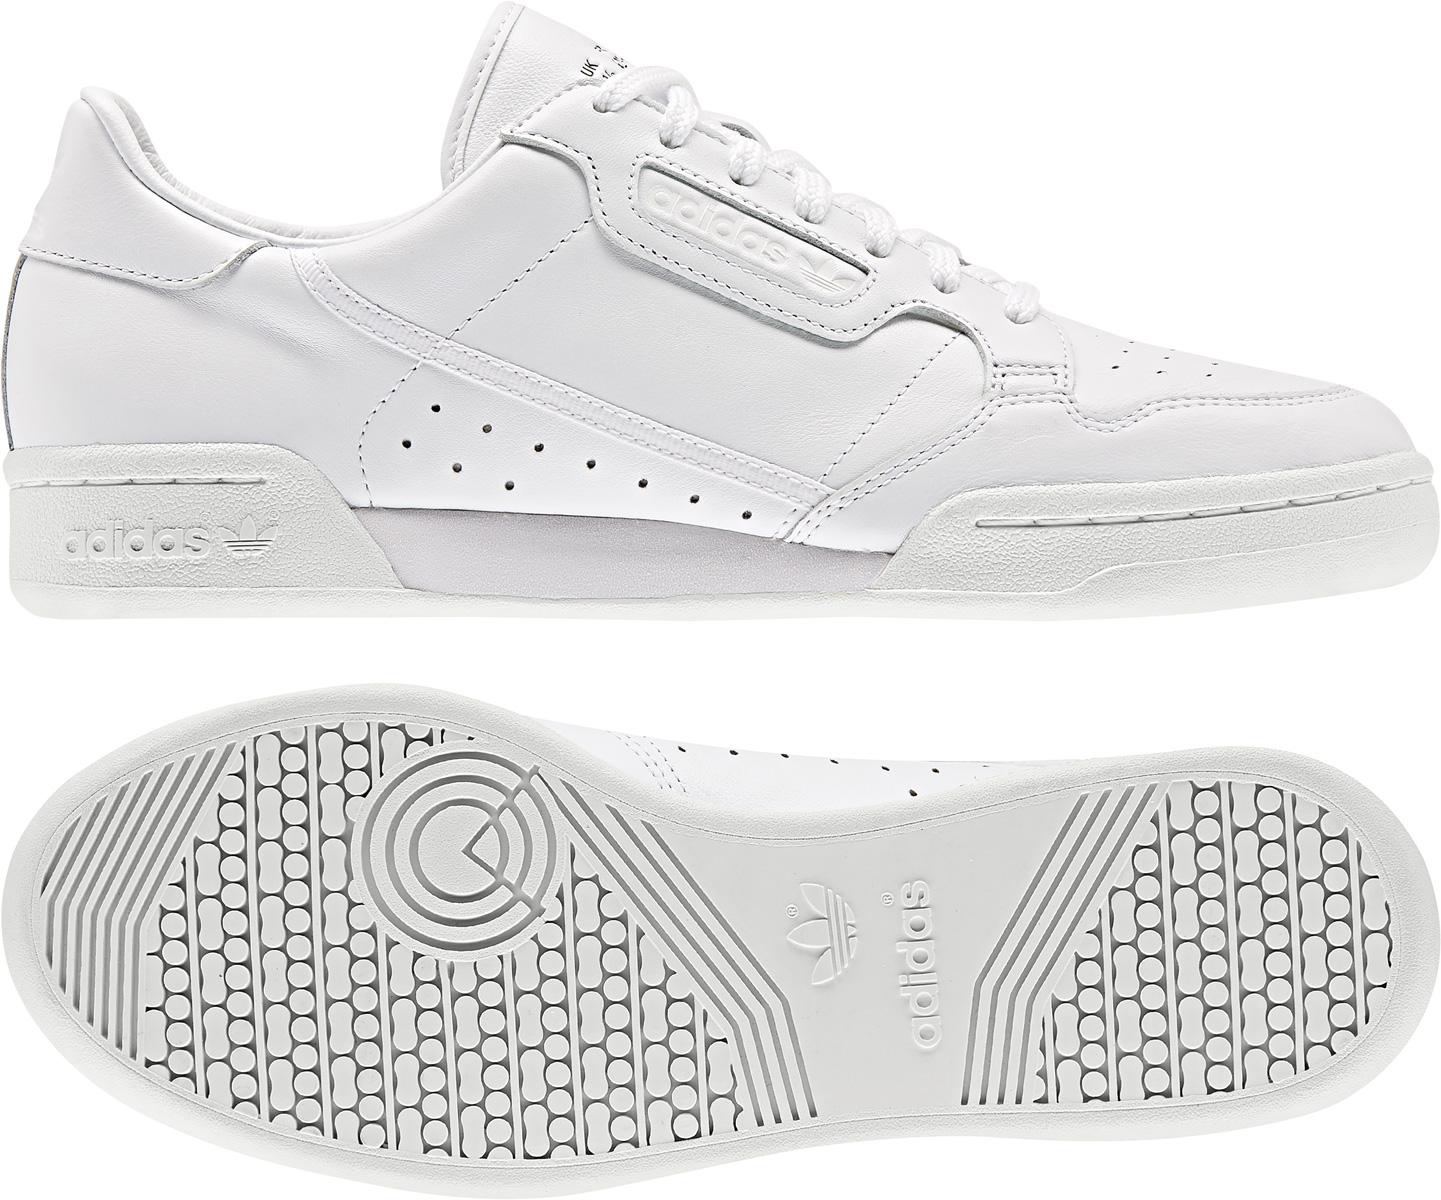 Adidas Continental 80 PVP 99,95€